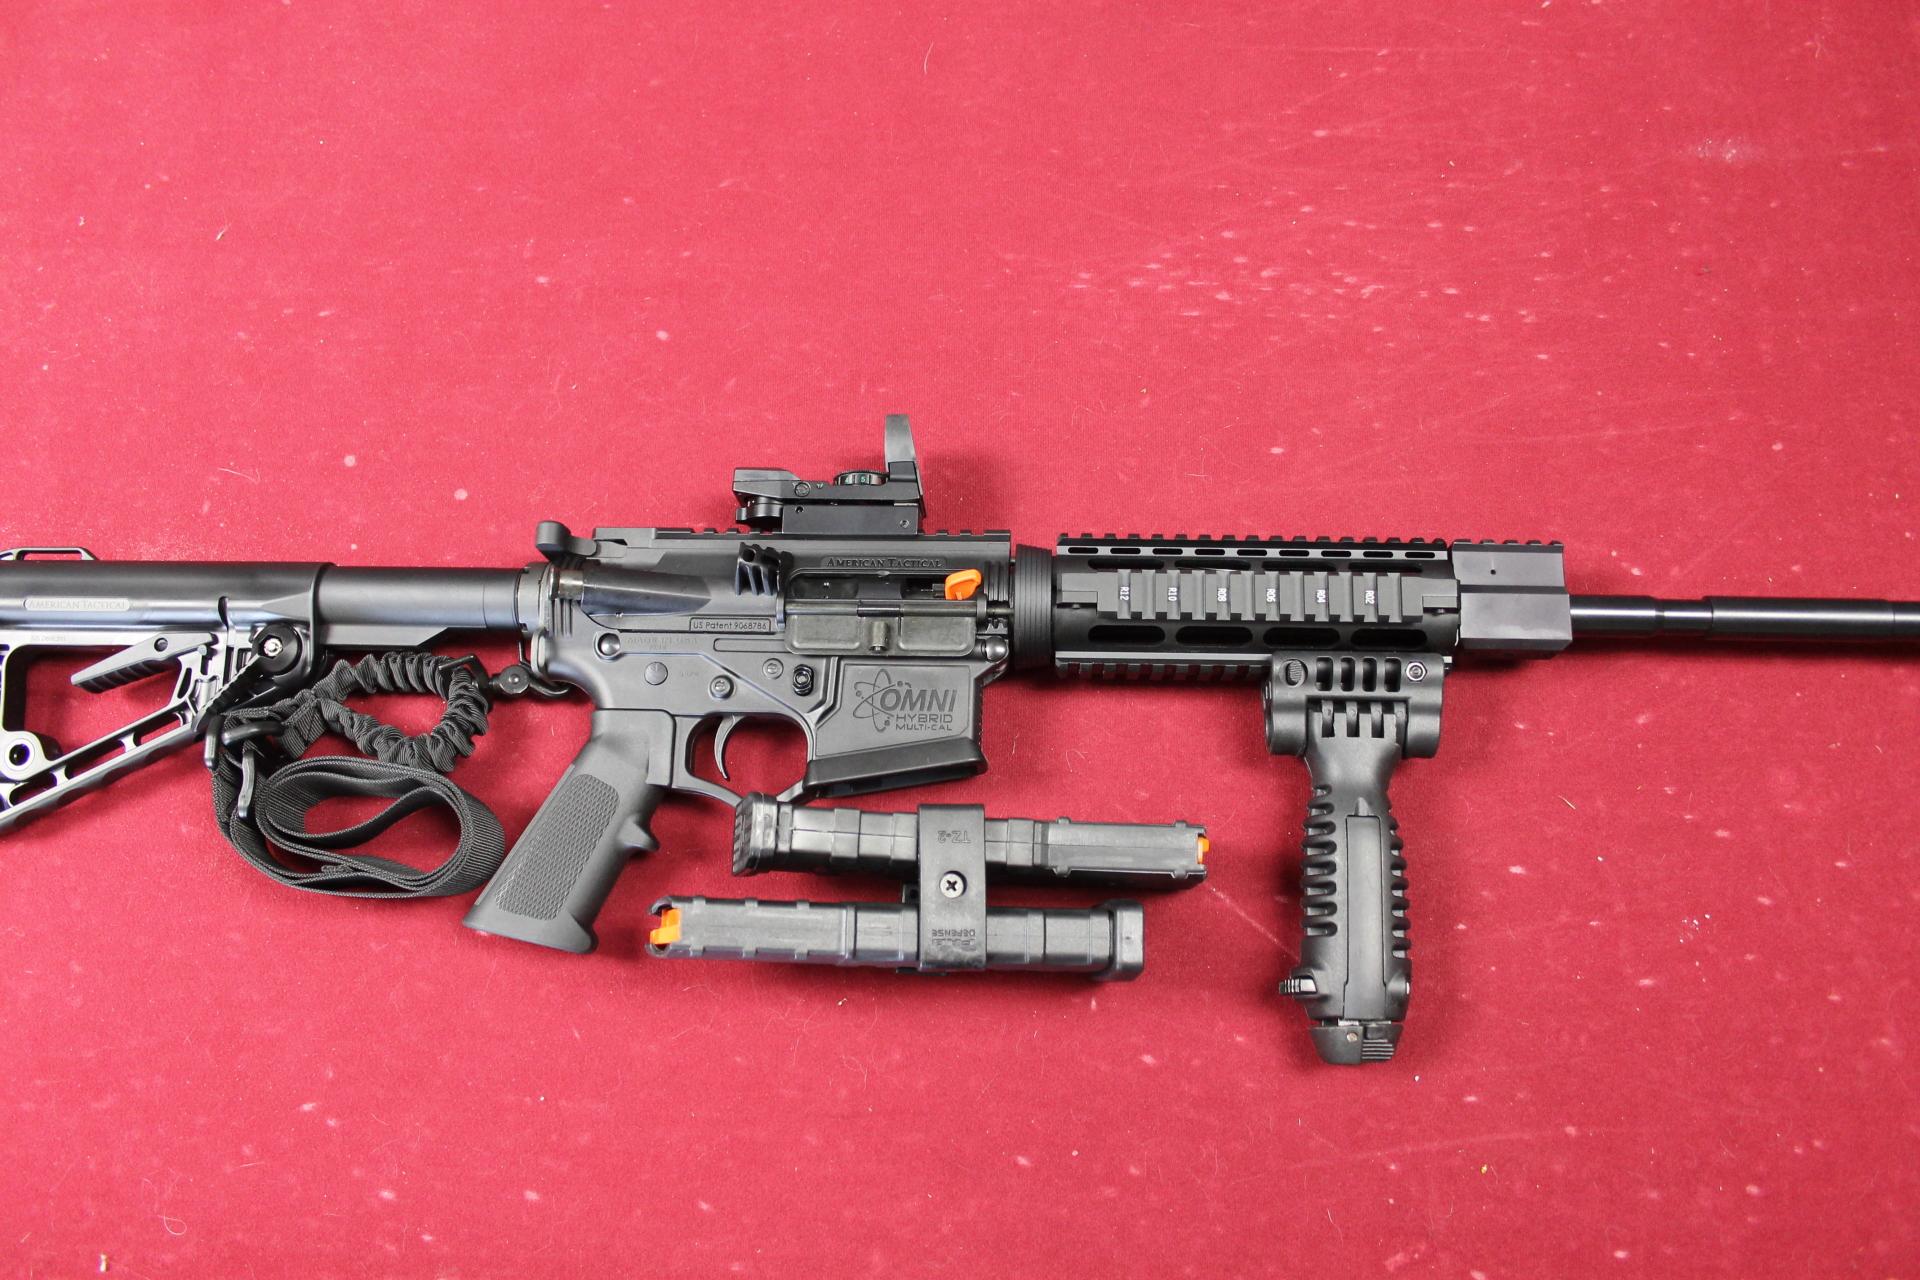 ATI AR 15 w acc. $550